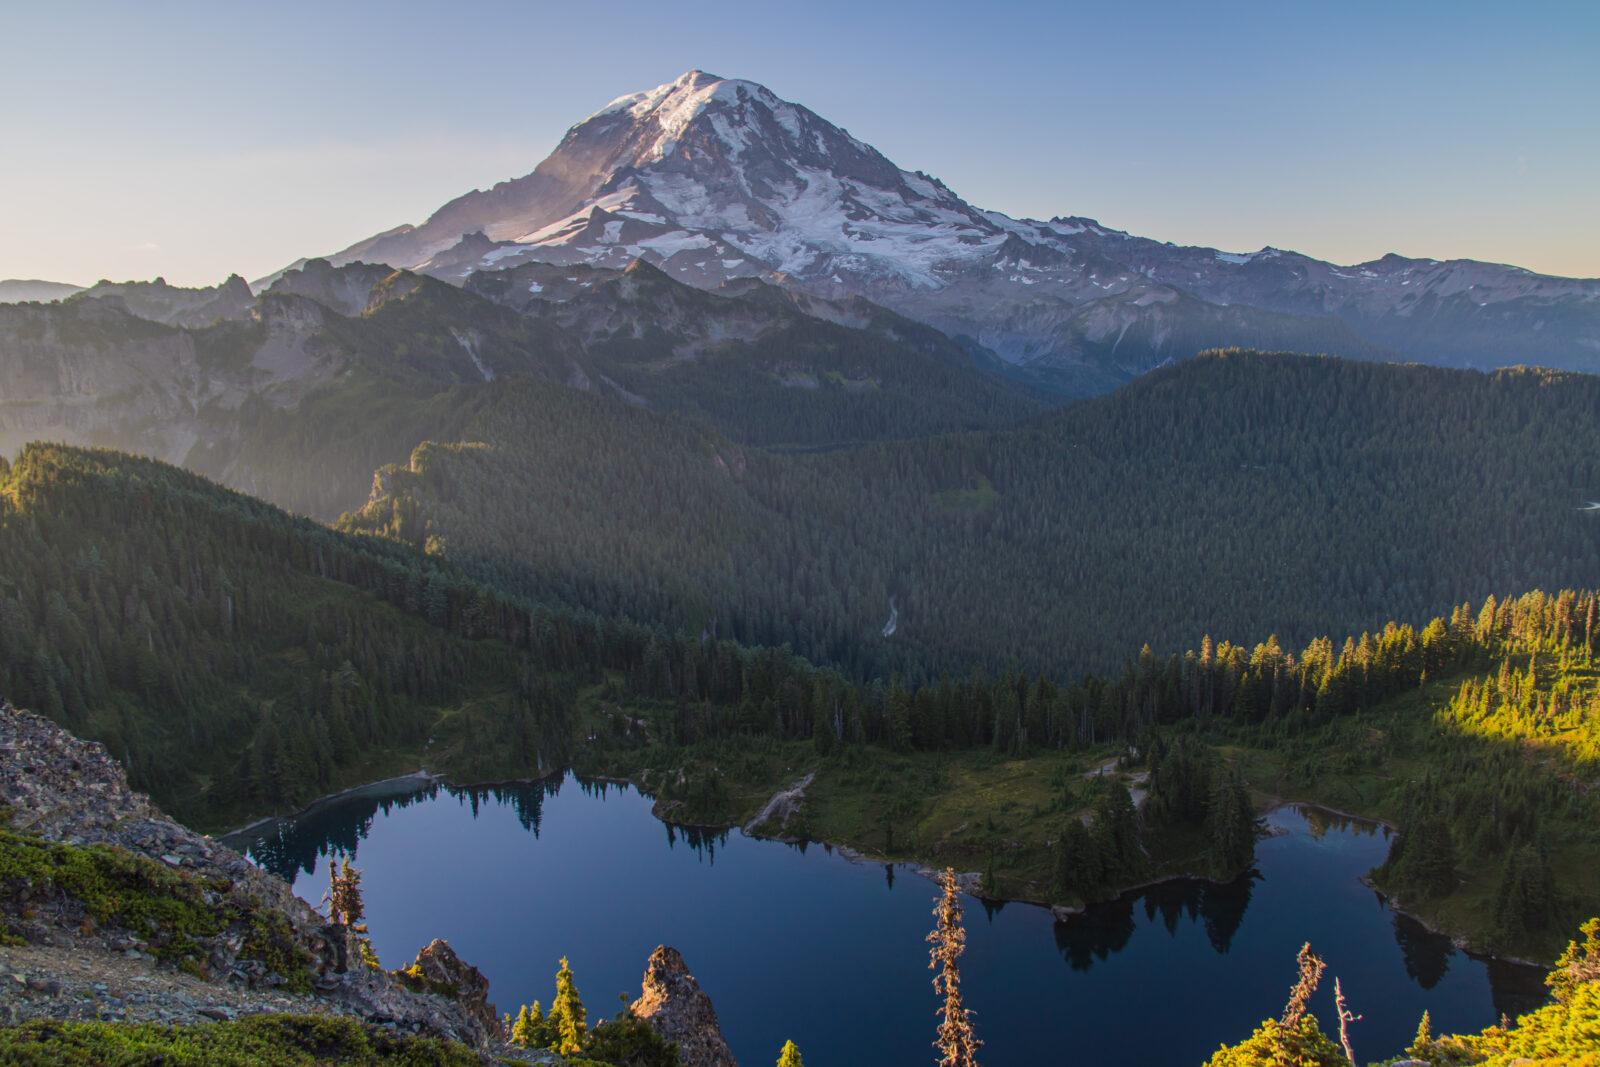 PNW Elopement Photographer, Eloping in nature, View of Tolmie Peak in Mount Rainier National Park